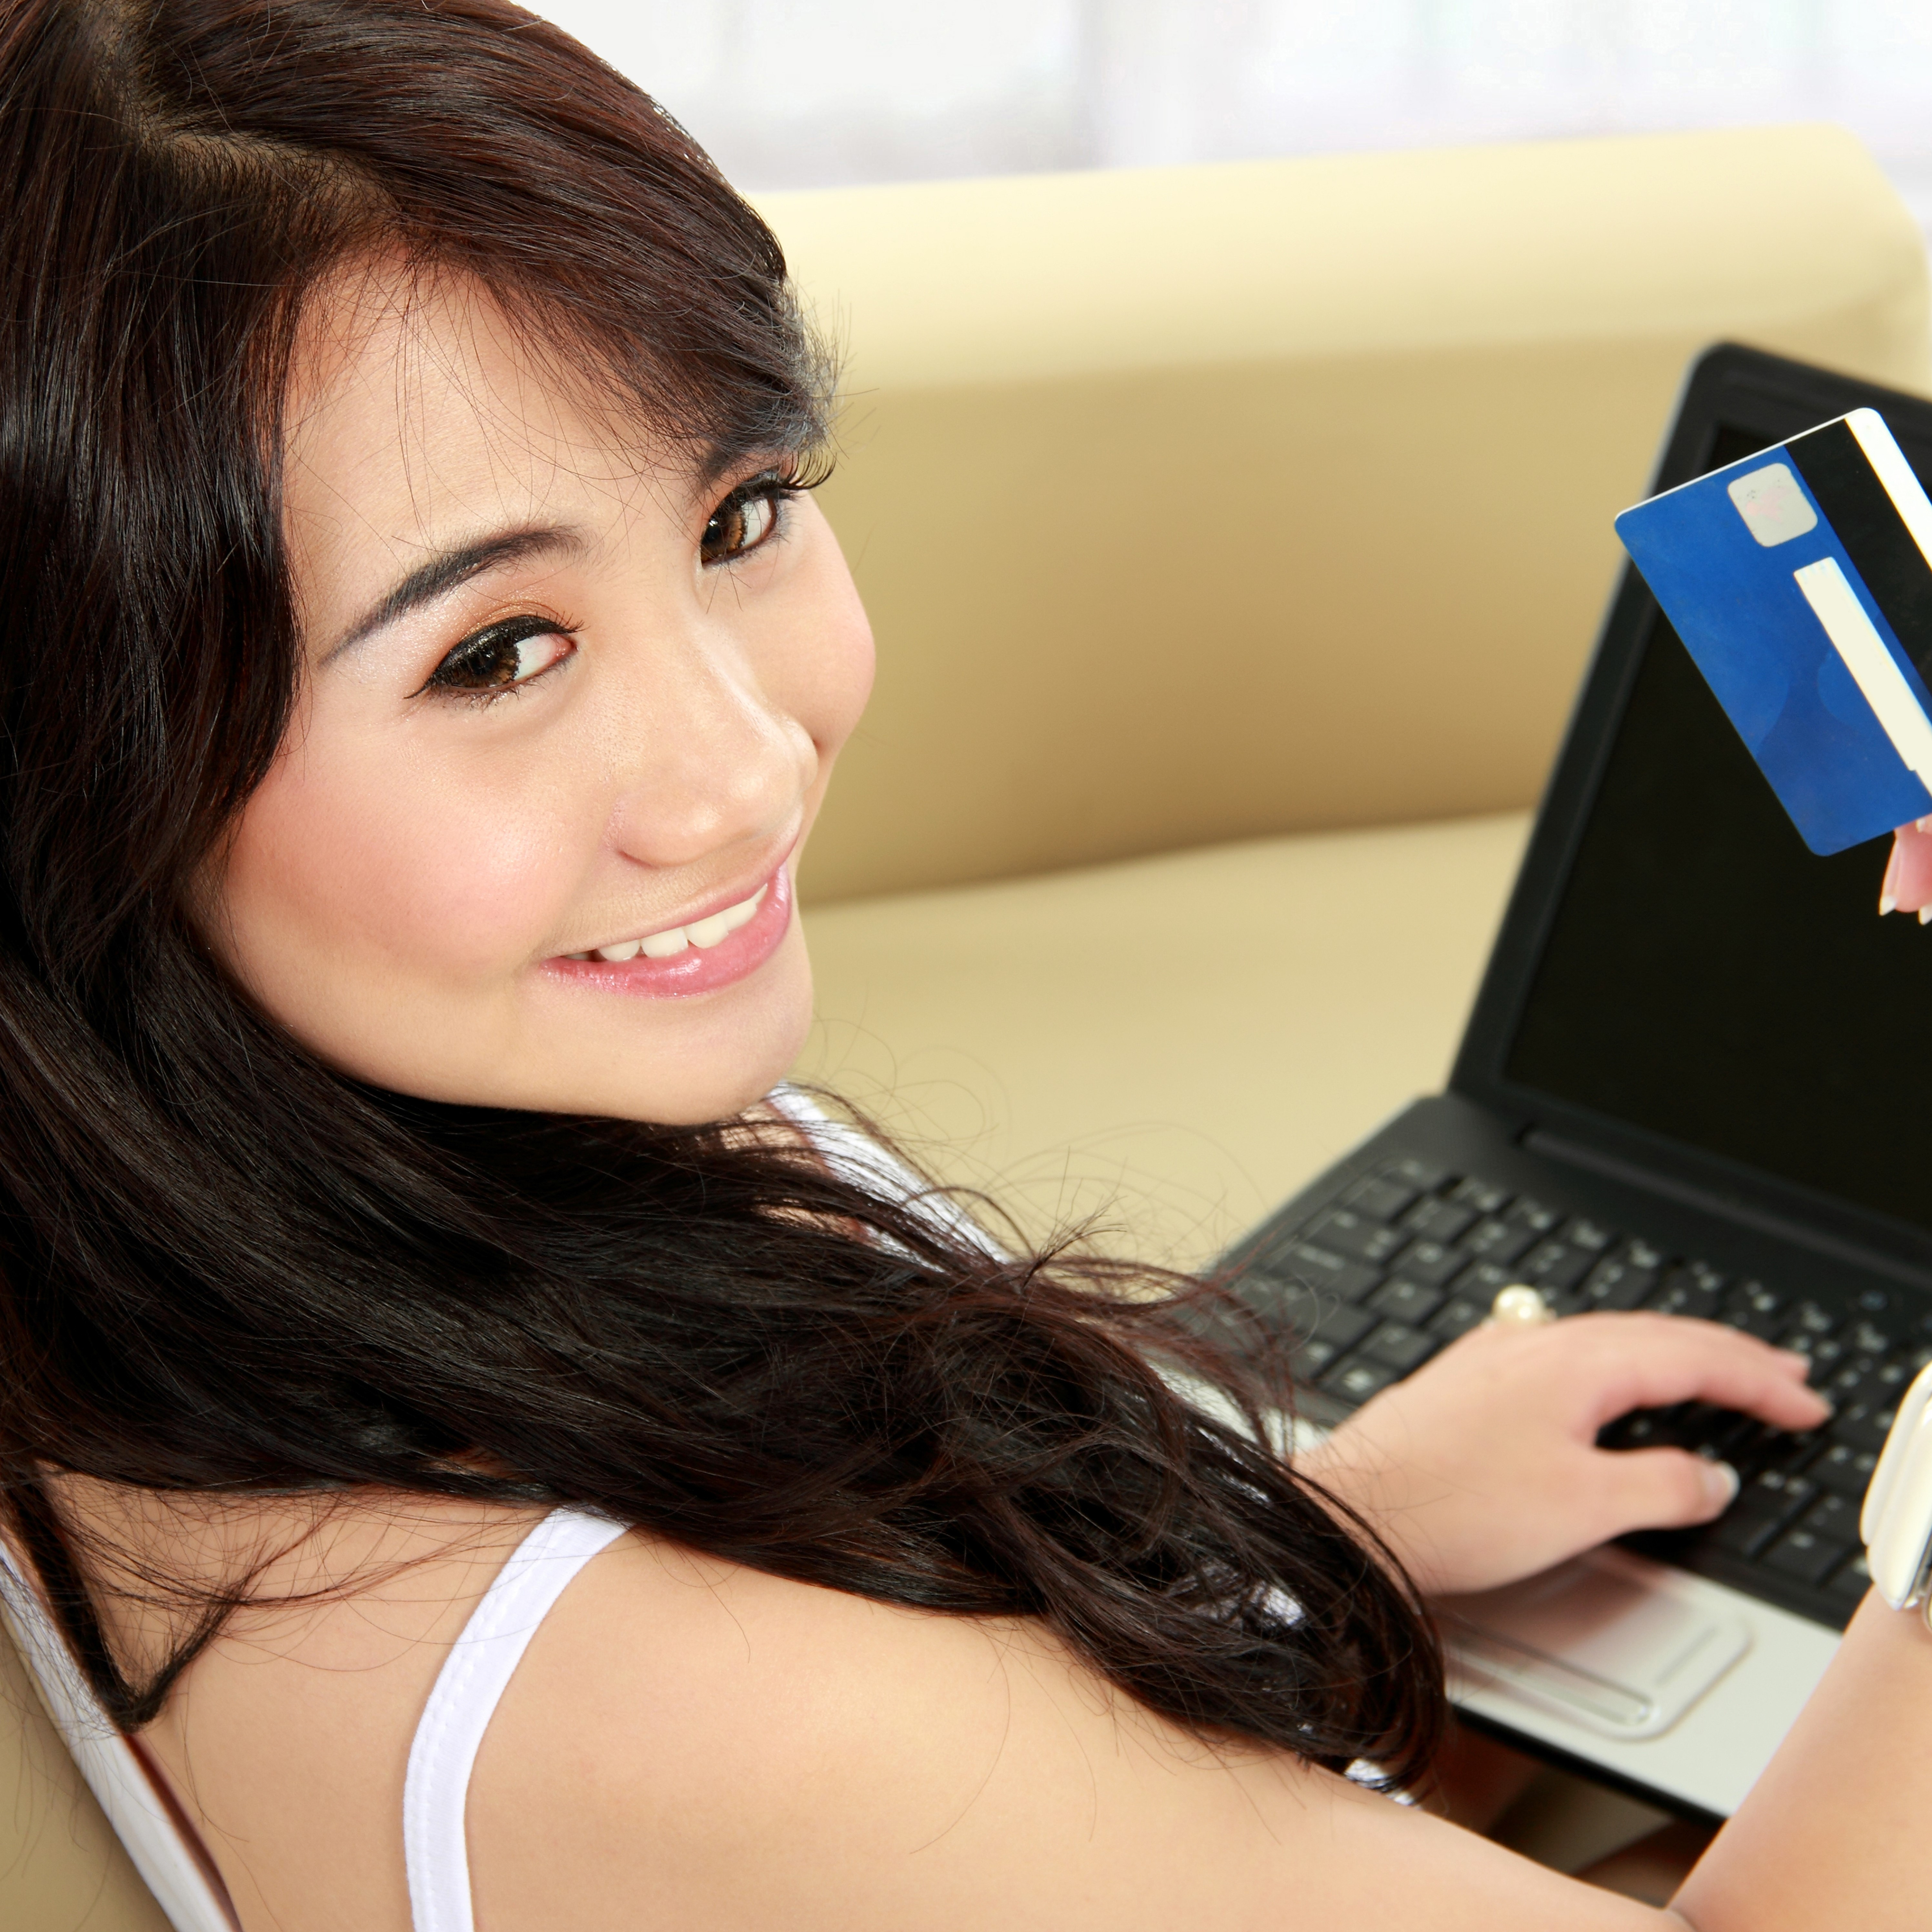 asia online payment methods 2017